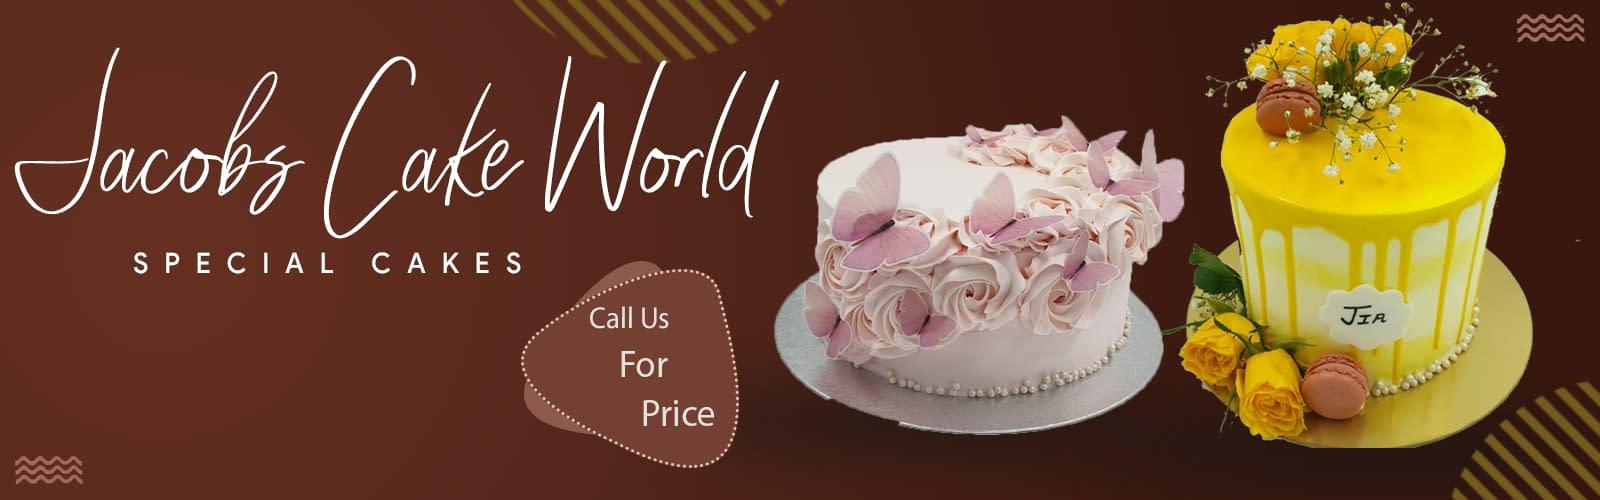 Jacobs_cake_world